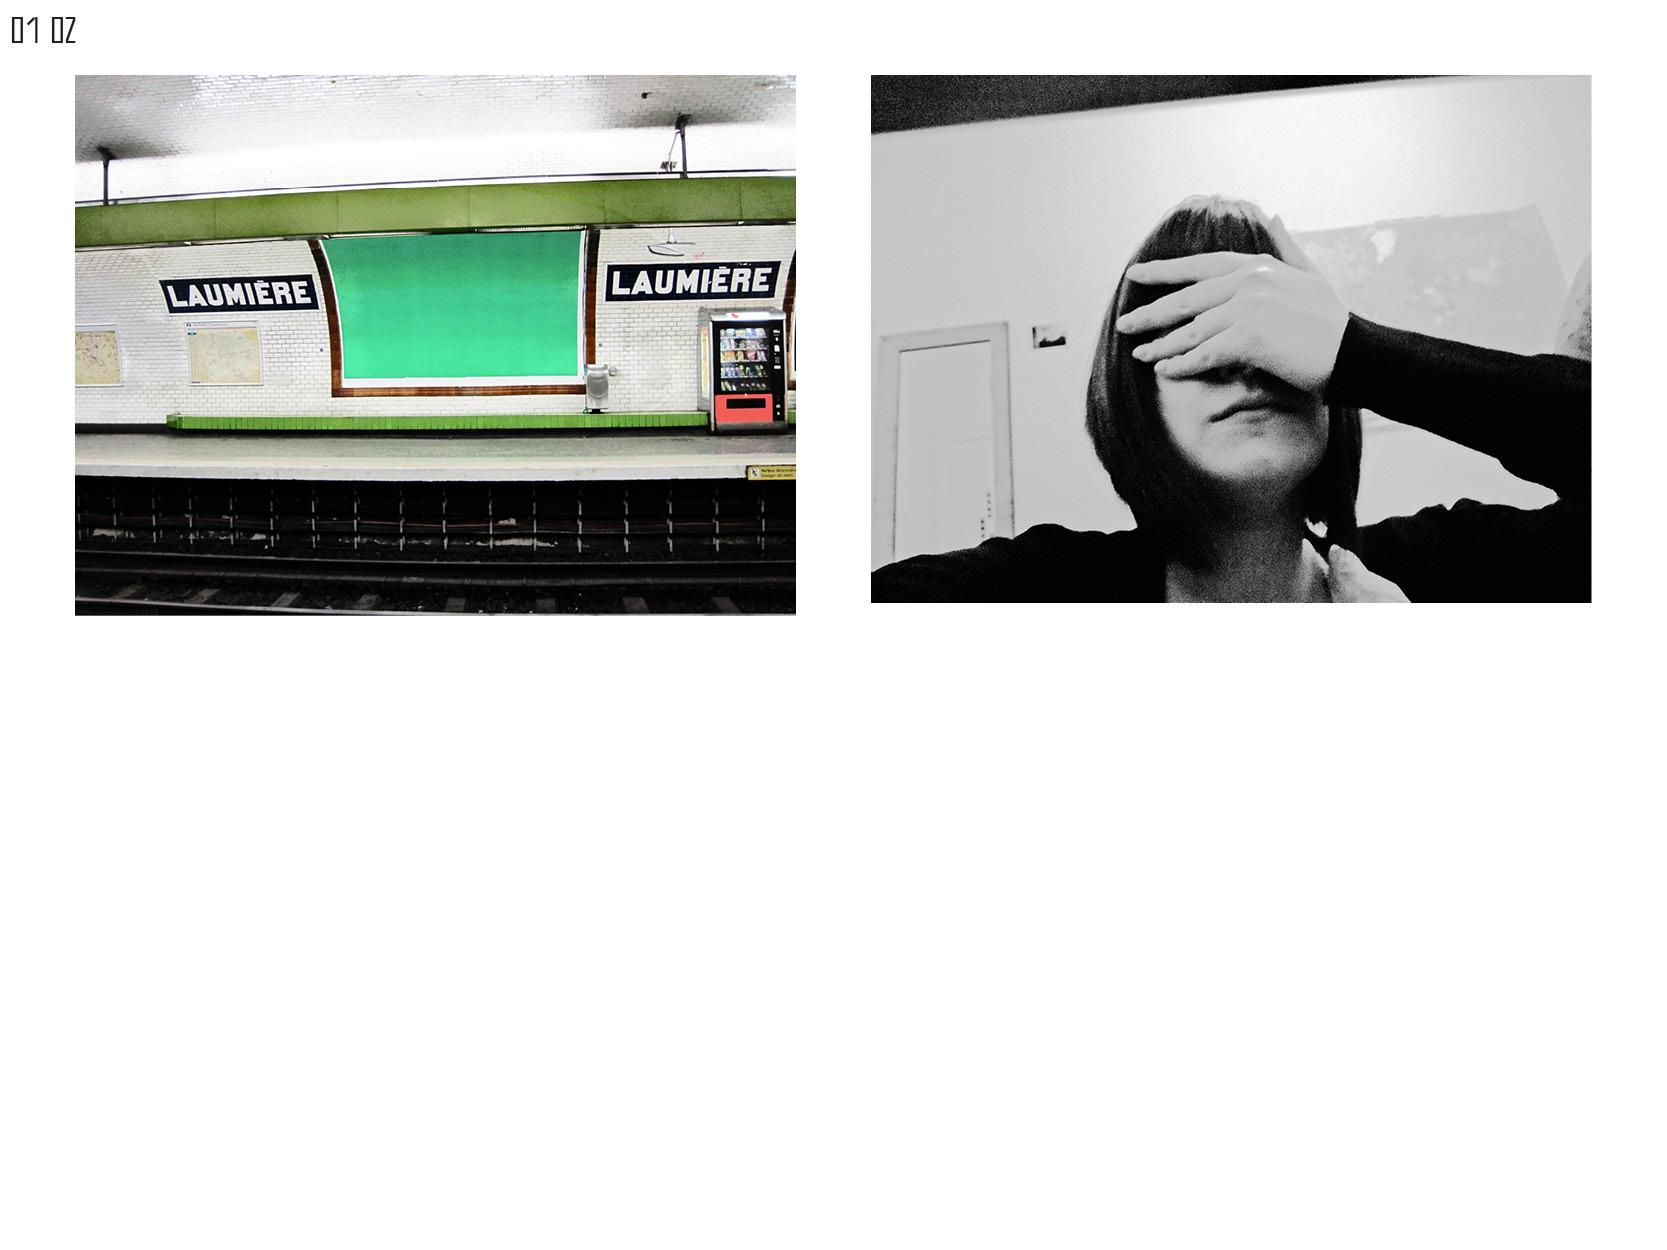 Gerrit-Schweiger-Dialog-Städte-Paris-Berlin-Jessica-Blank-Experiment-Fotoserie-Tagebuch-visuelle-Kommunikation-92